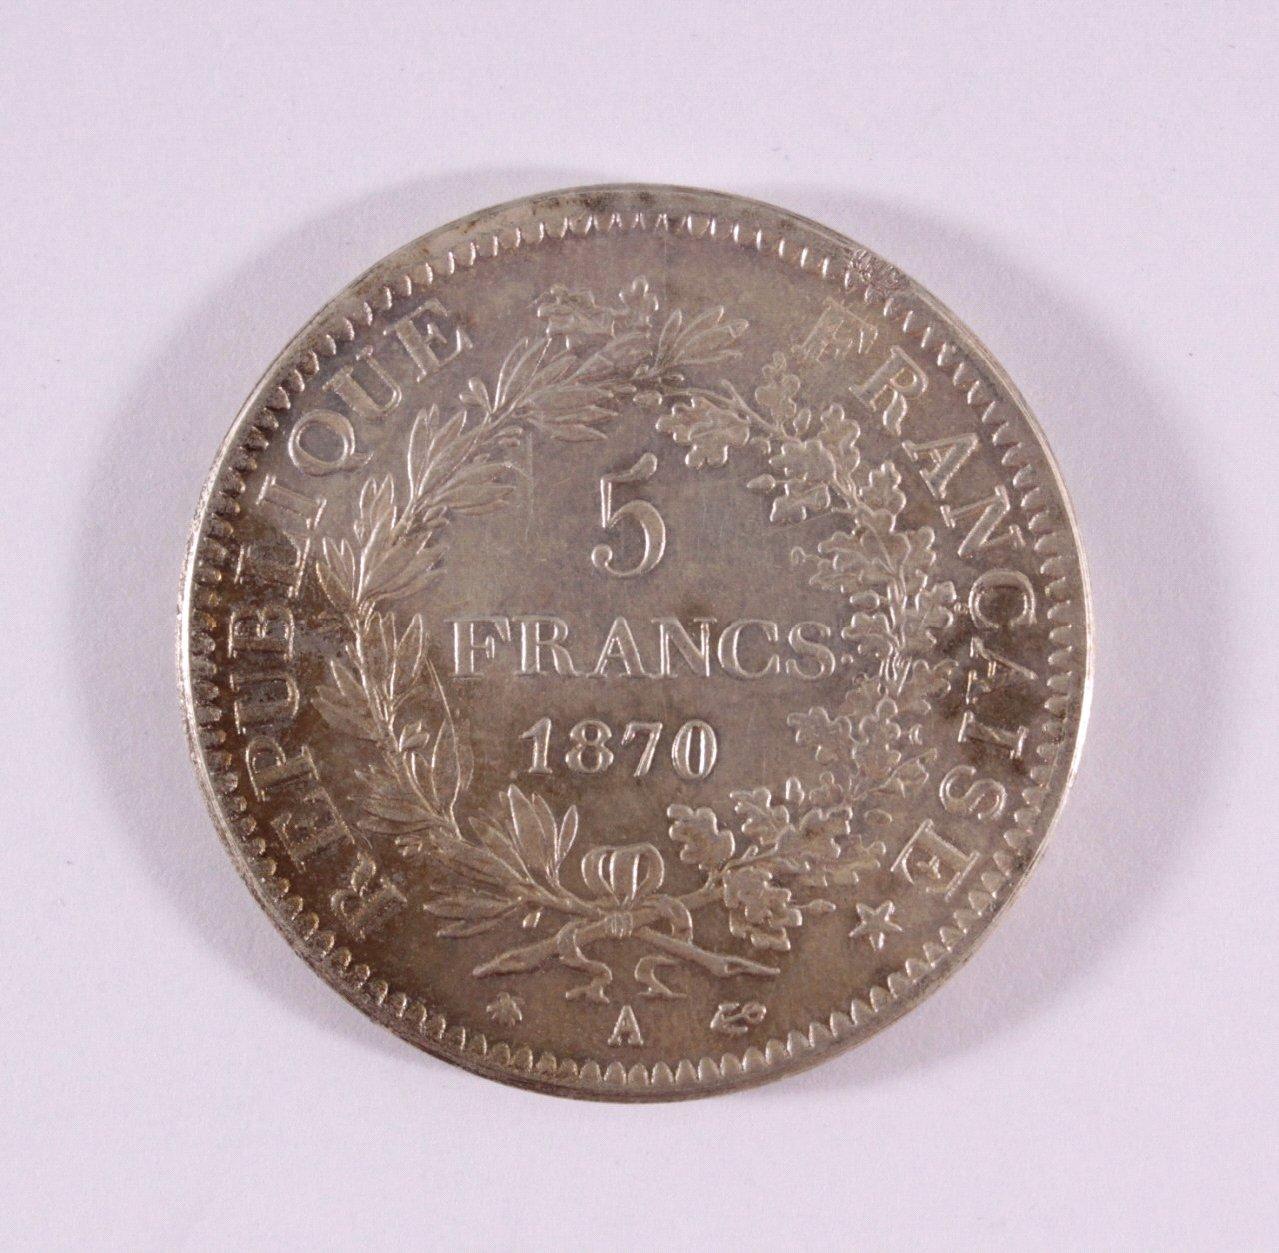 Frankreich, 5 Frances 1870, Napoleon III-1